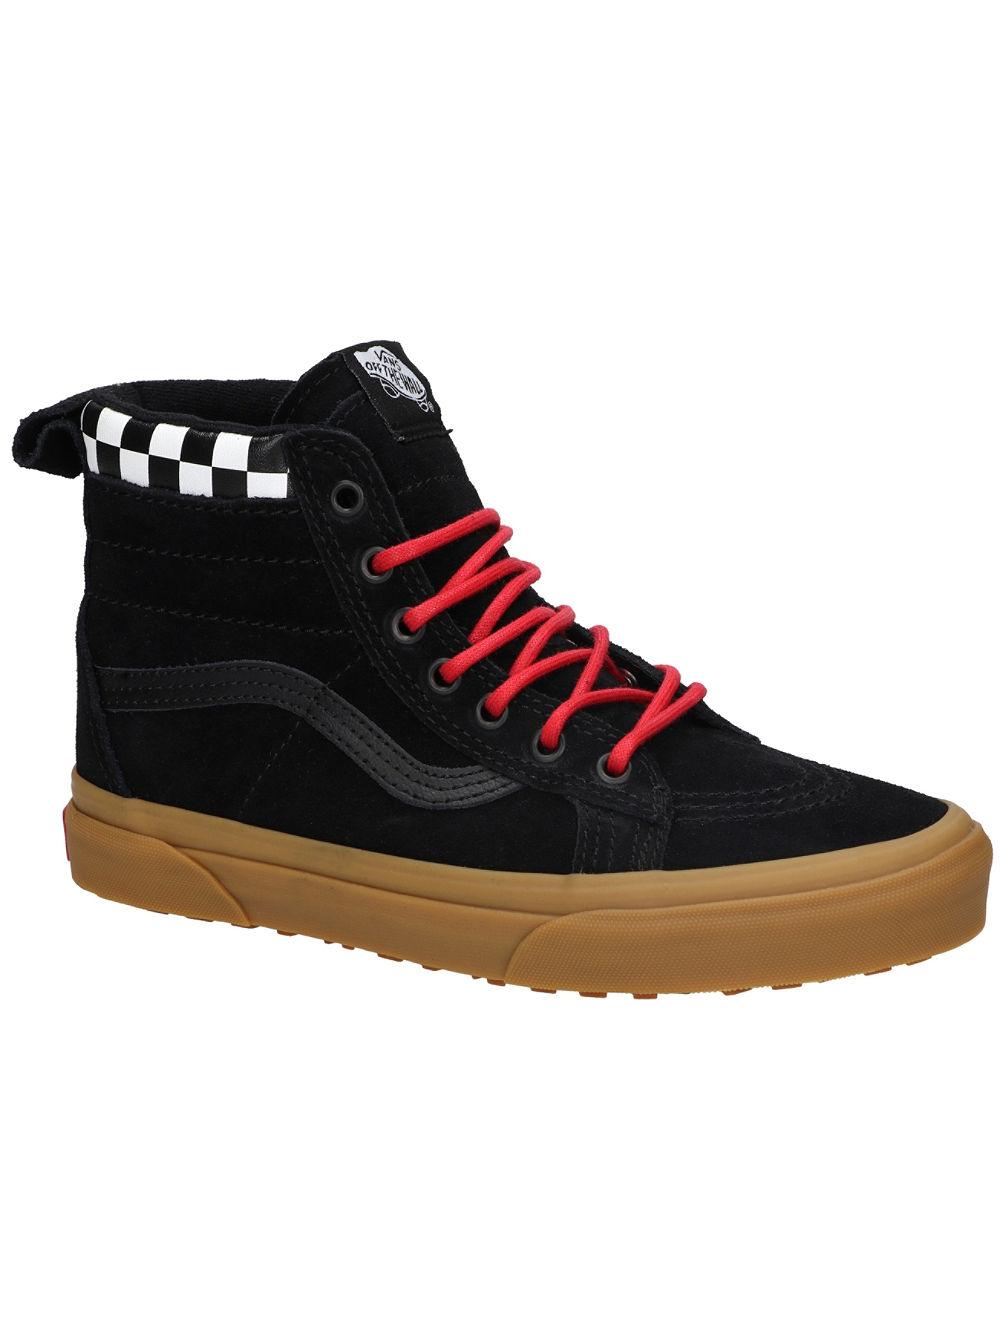 bc15c82d36 Buy Vans Checkerboard MTE Sk8-Hi Sneakers online at Blue Tomato